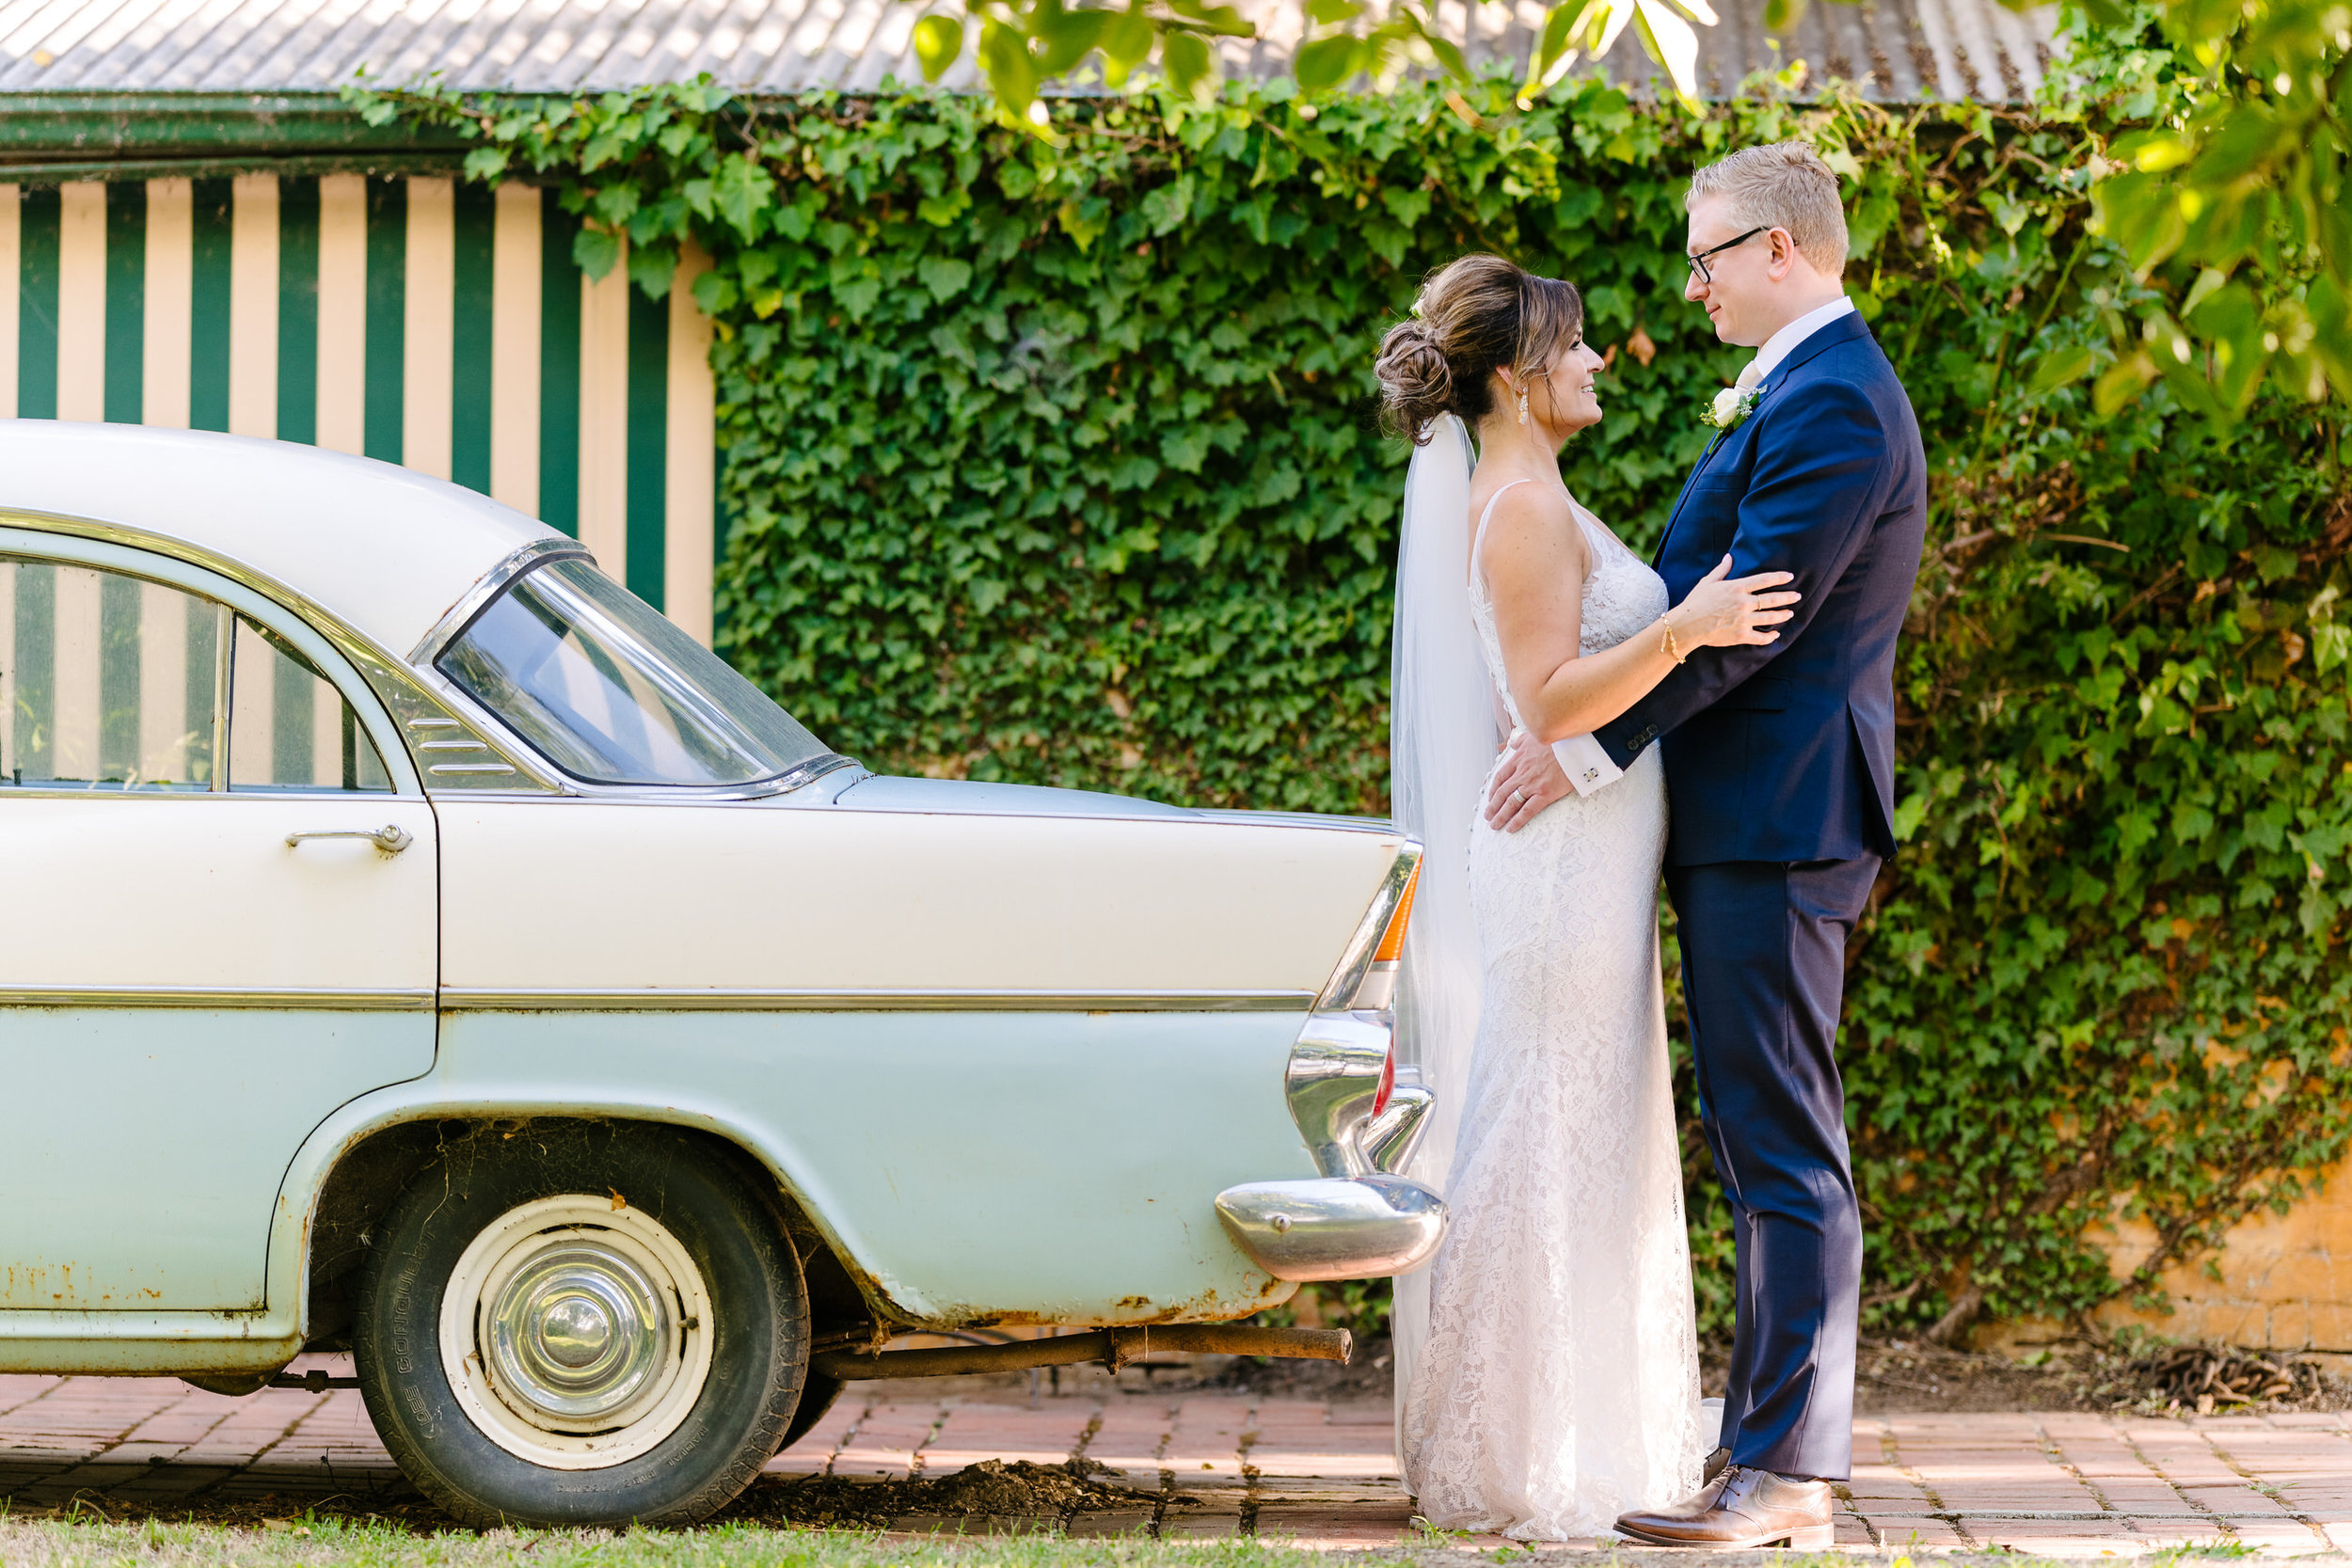 Justin_And_Jim_Photography_Chateau_Dore_Bendigo_Wedding61.JPG